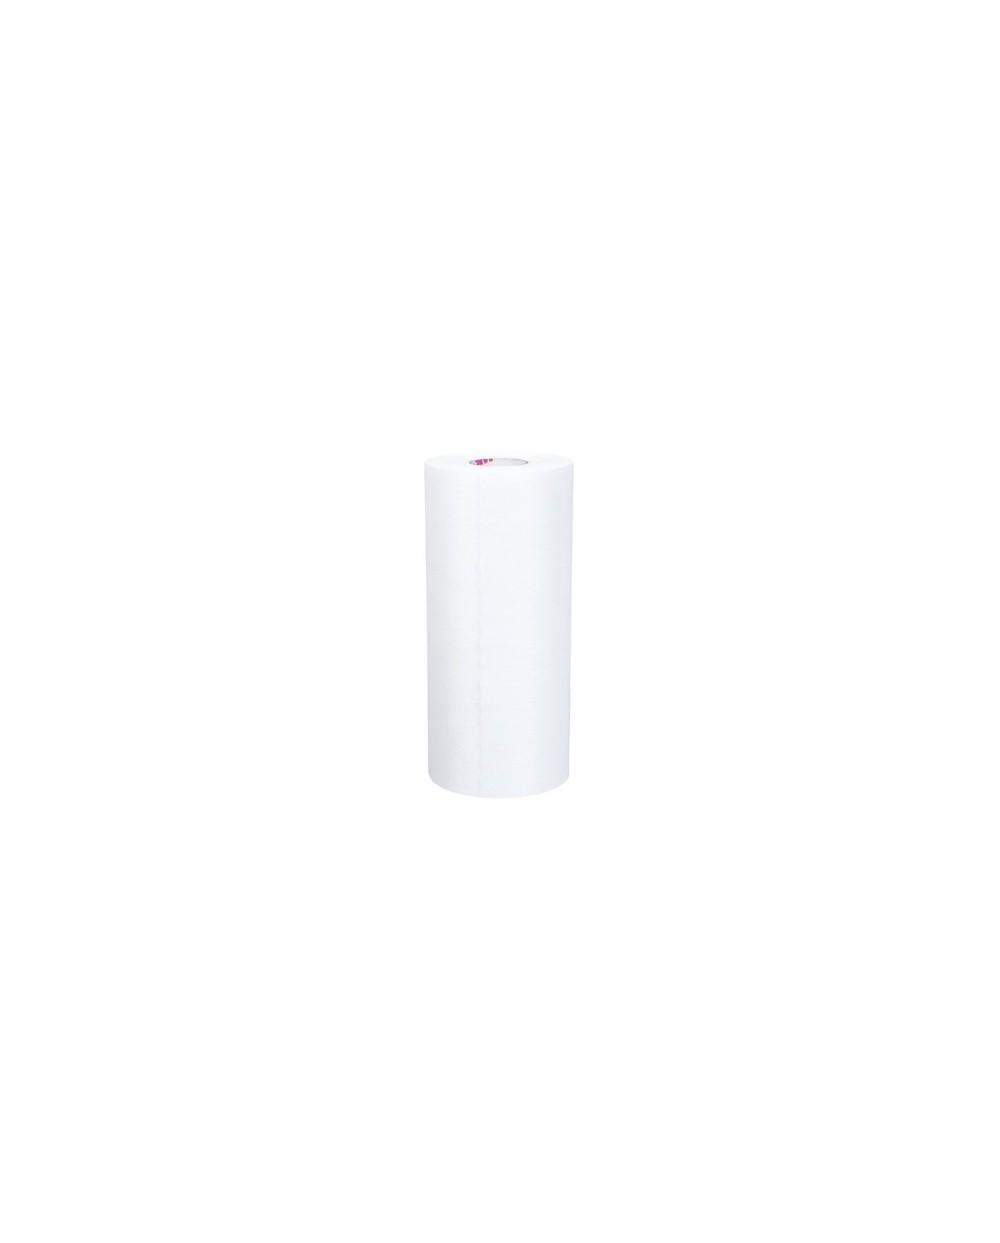 Sparadrap MEDIPORE HP, 15 cm x 9,1 m, non stérile. Boîte de 12 bobines